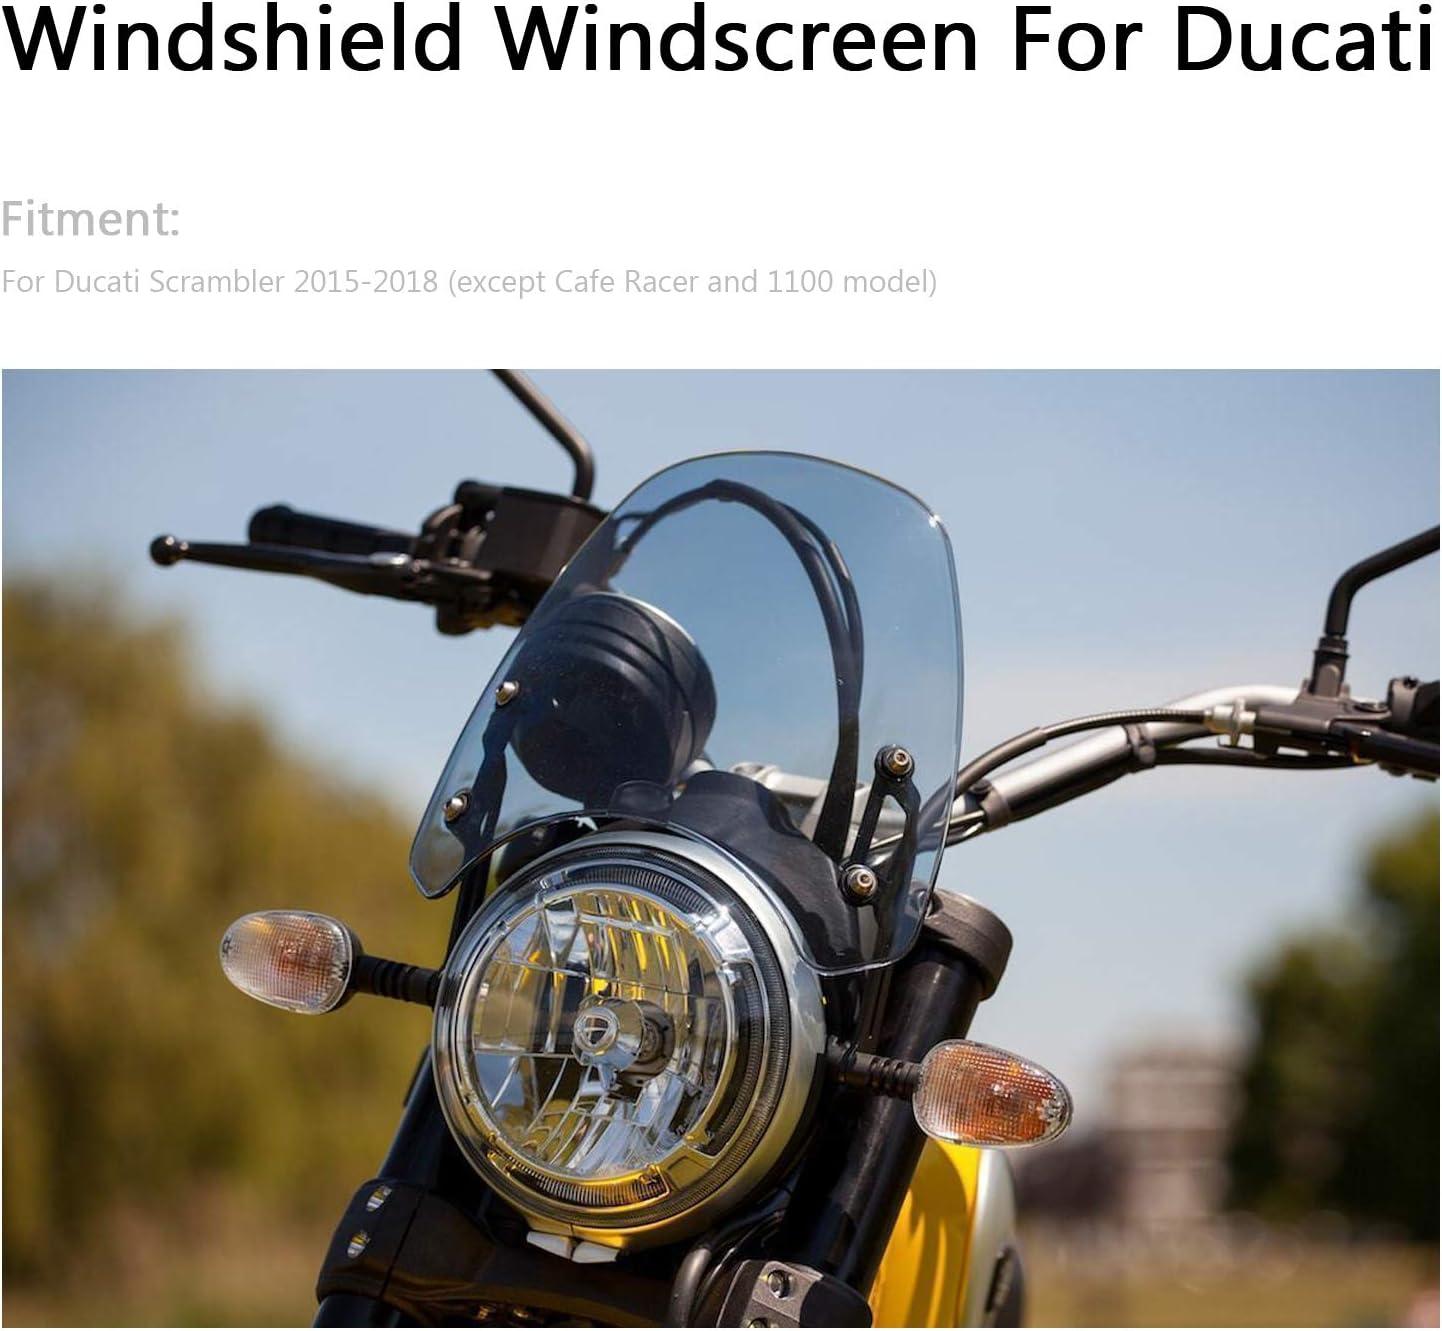 Sport Windschutzscheibe mit ABS Aerodynamik Design f/ür Du-ca-ti Scrambler 2015-2018 Topteng Motorrad Windschutzscheibe